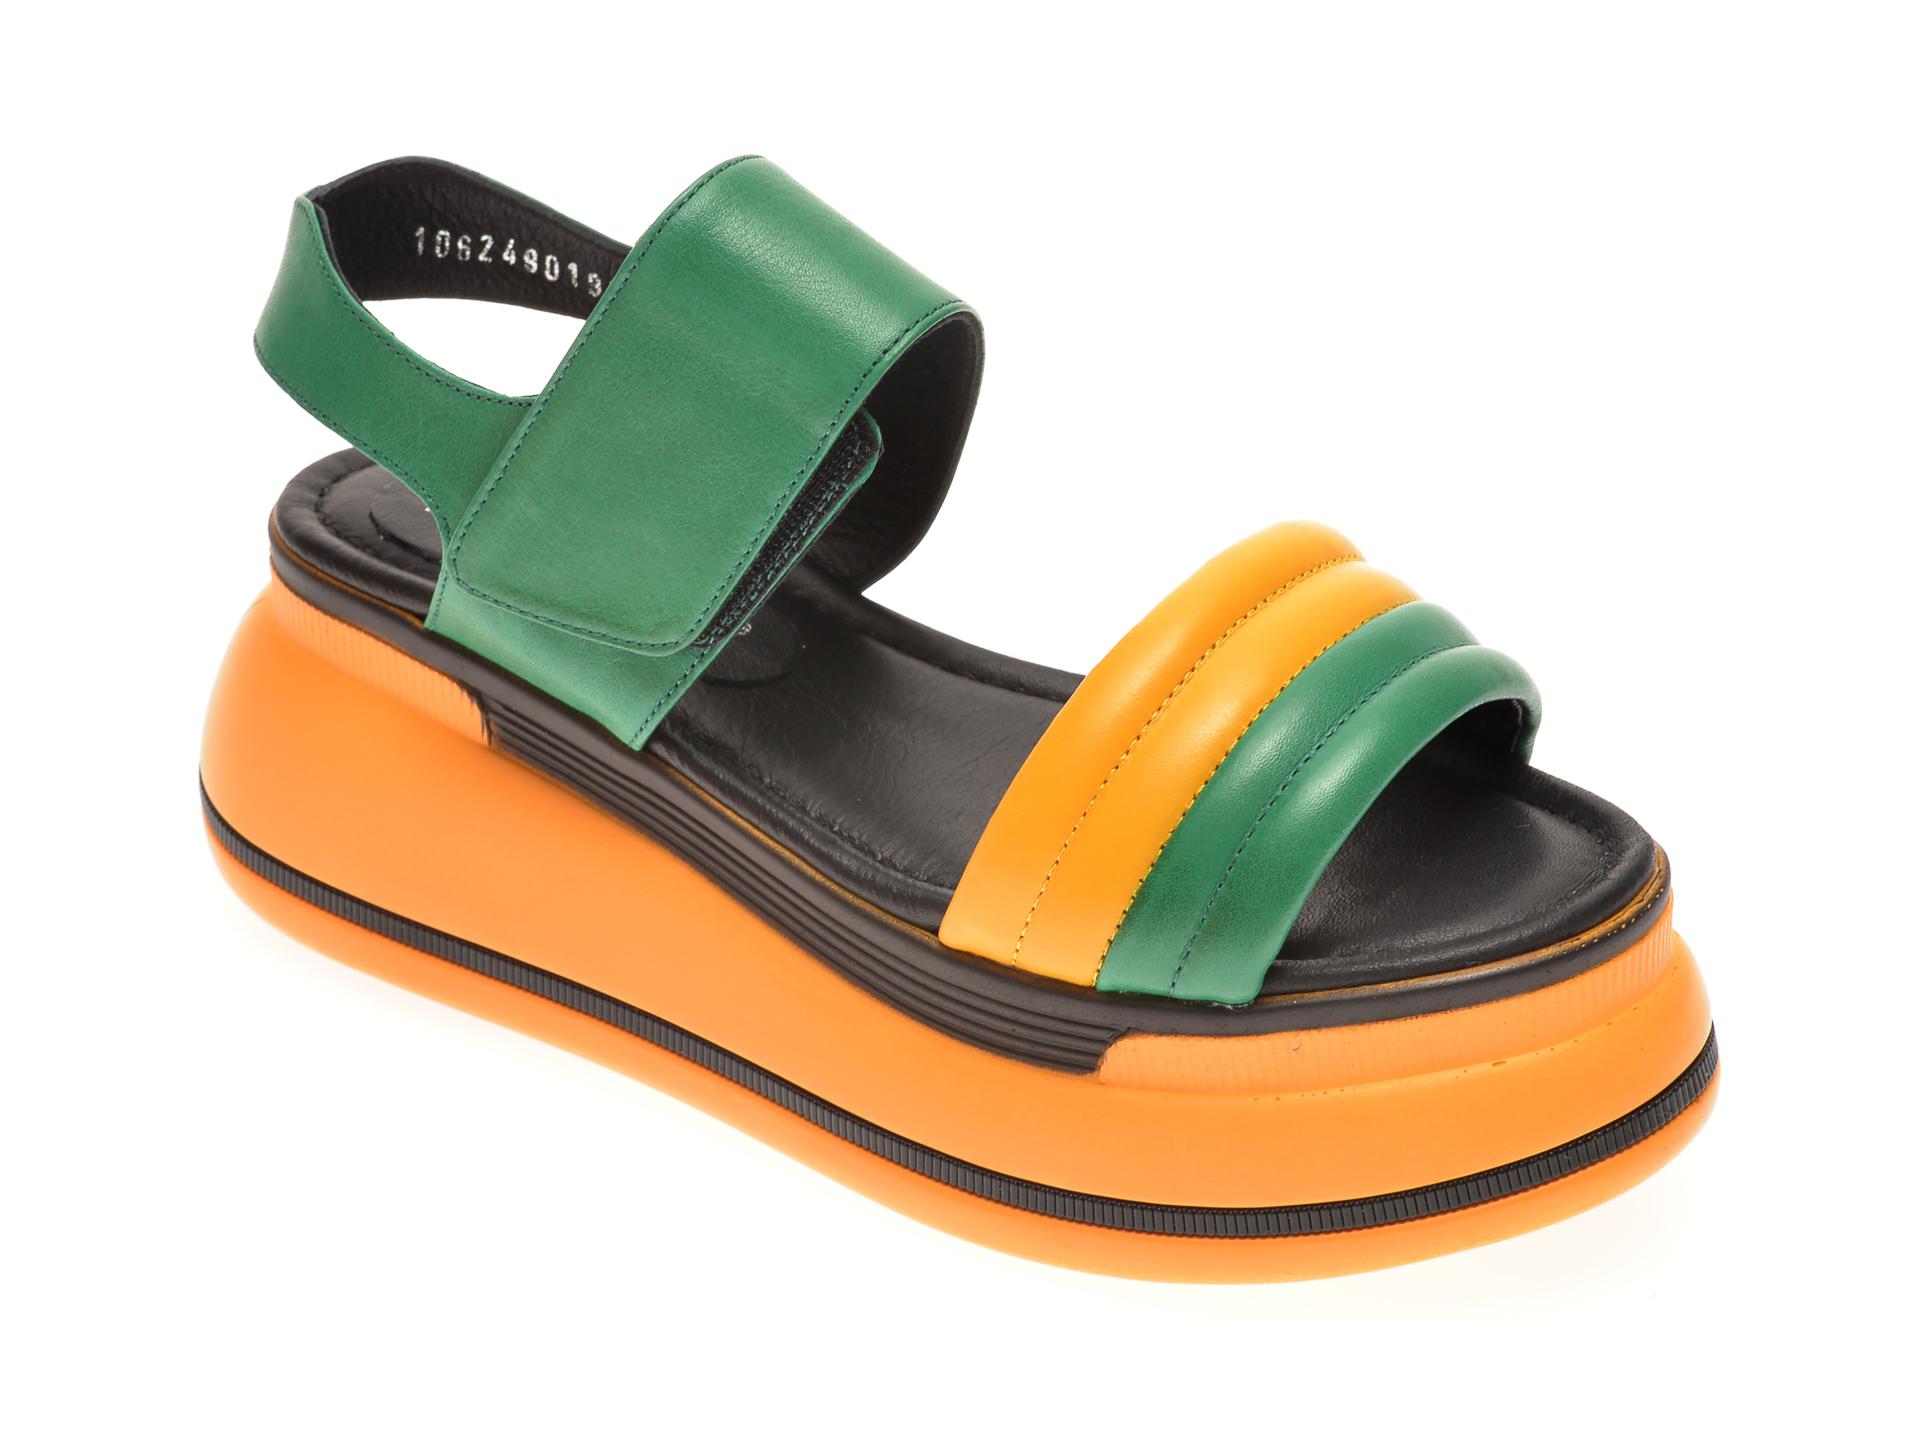 Sandale MISS LIZA verzi, 1182490, din piele naturala